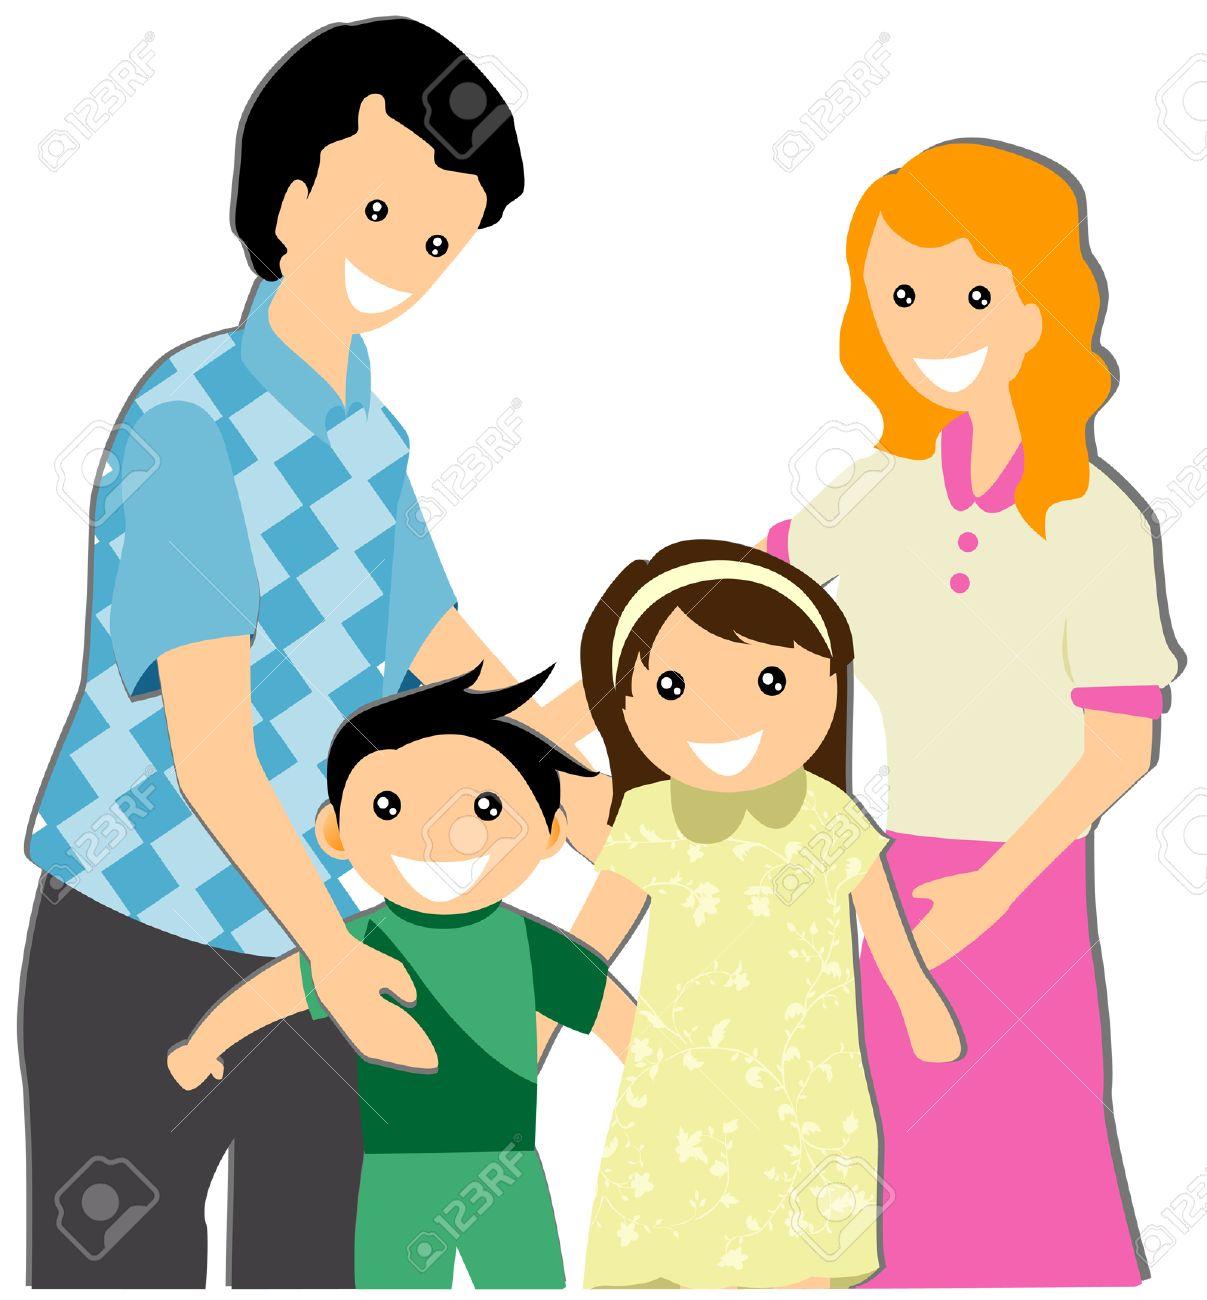 My Family Illustration.